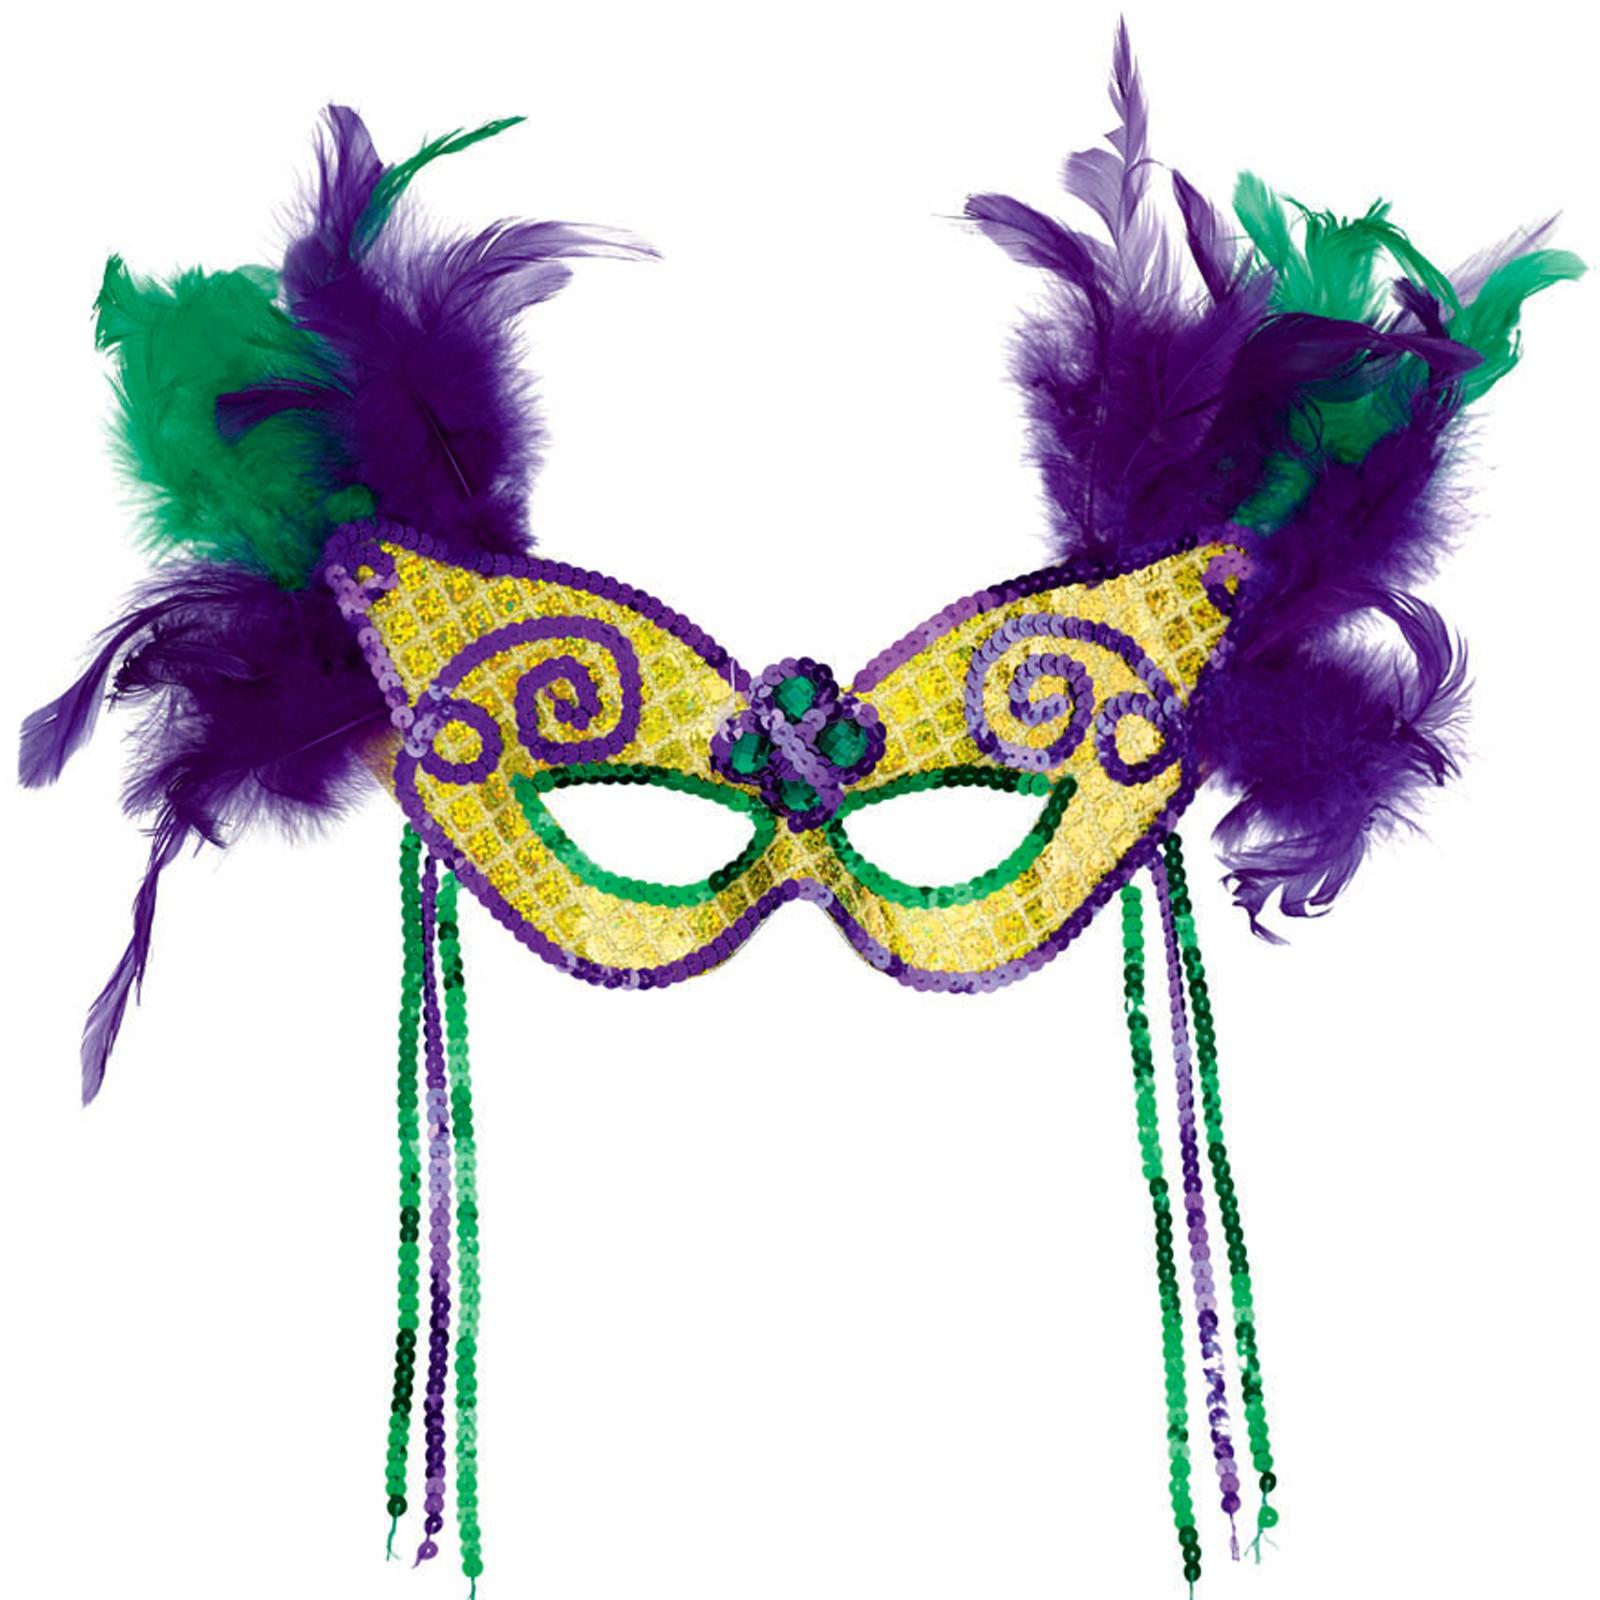 1600x1600 Mardi Gras Carnival Masks 2013 Latest Amp Beautiful Masks 2013